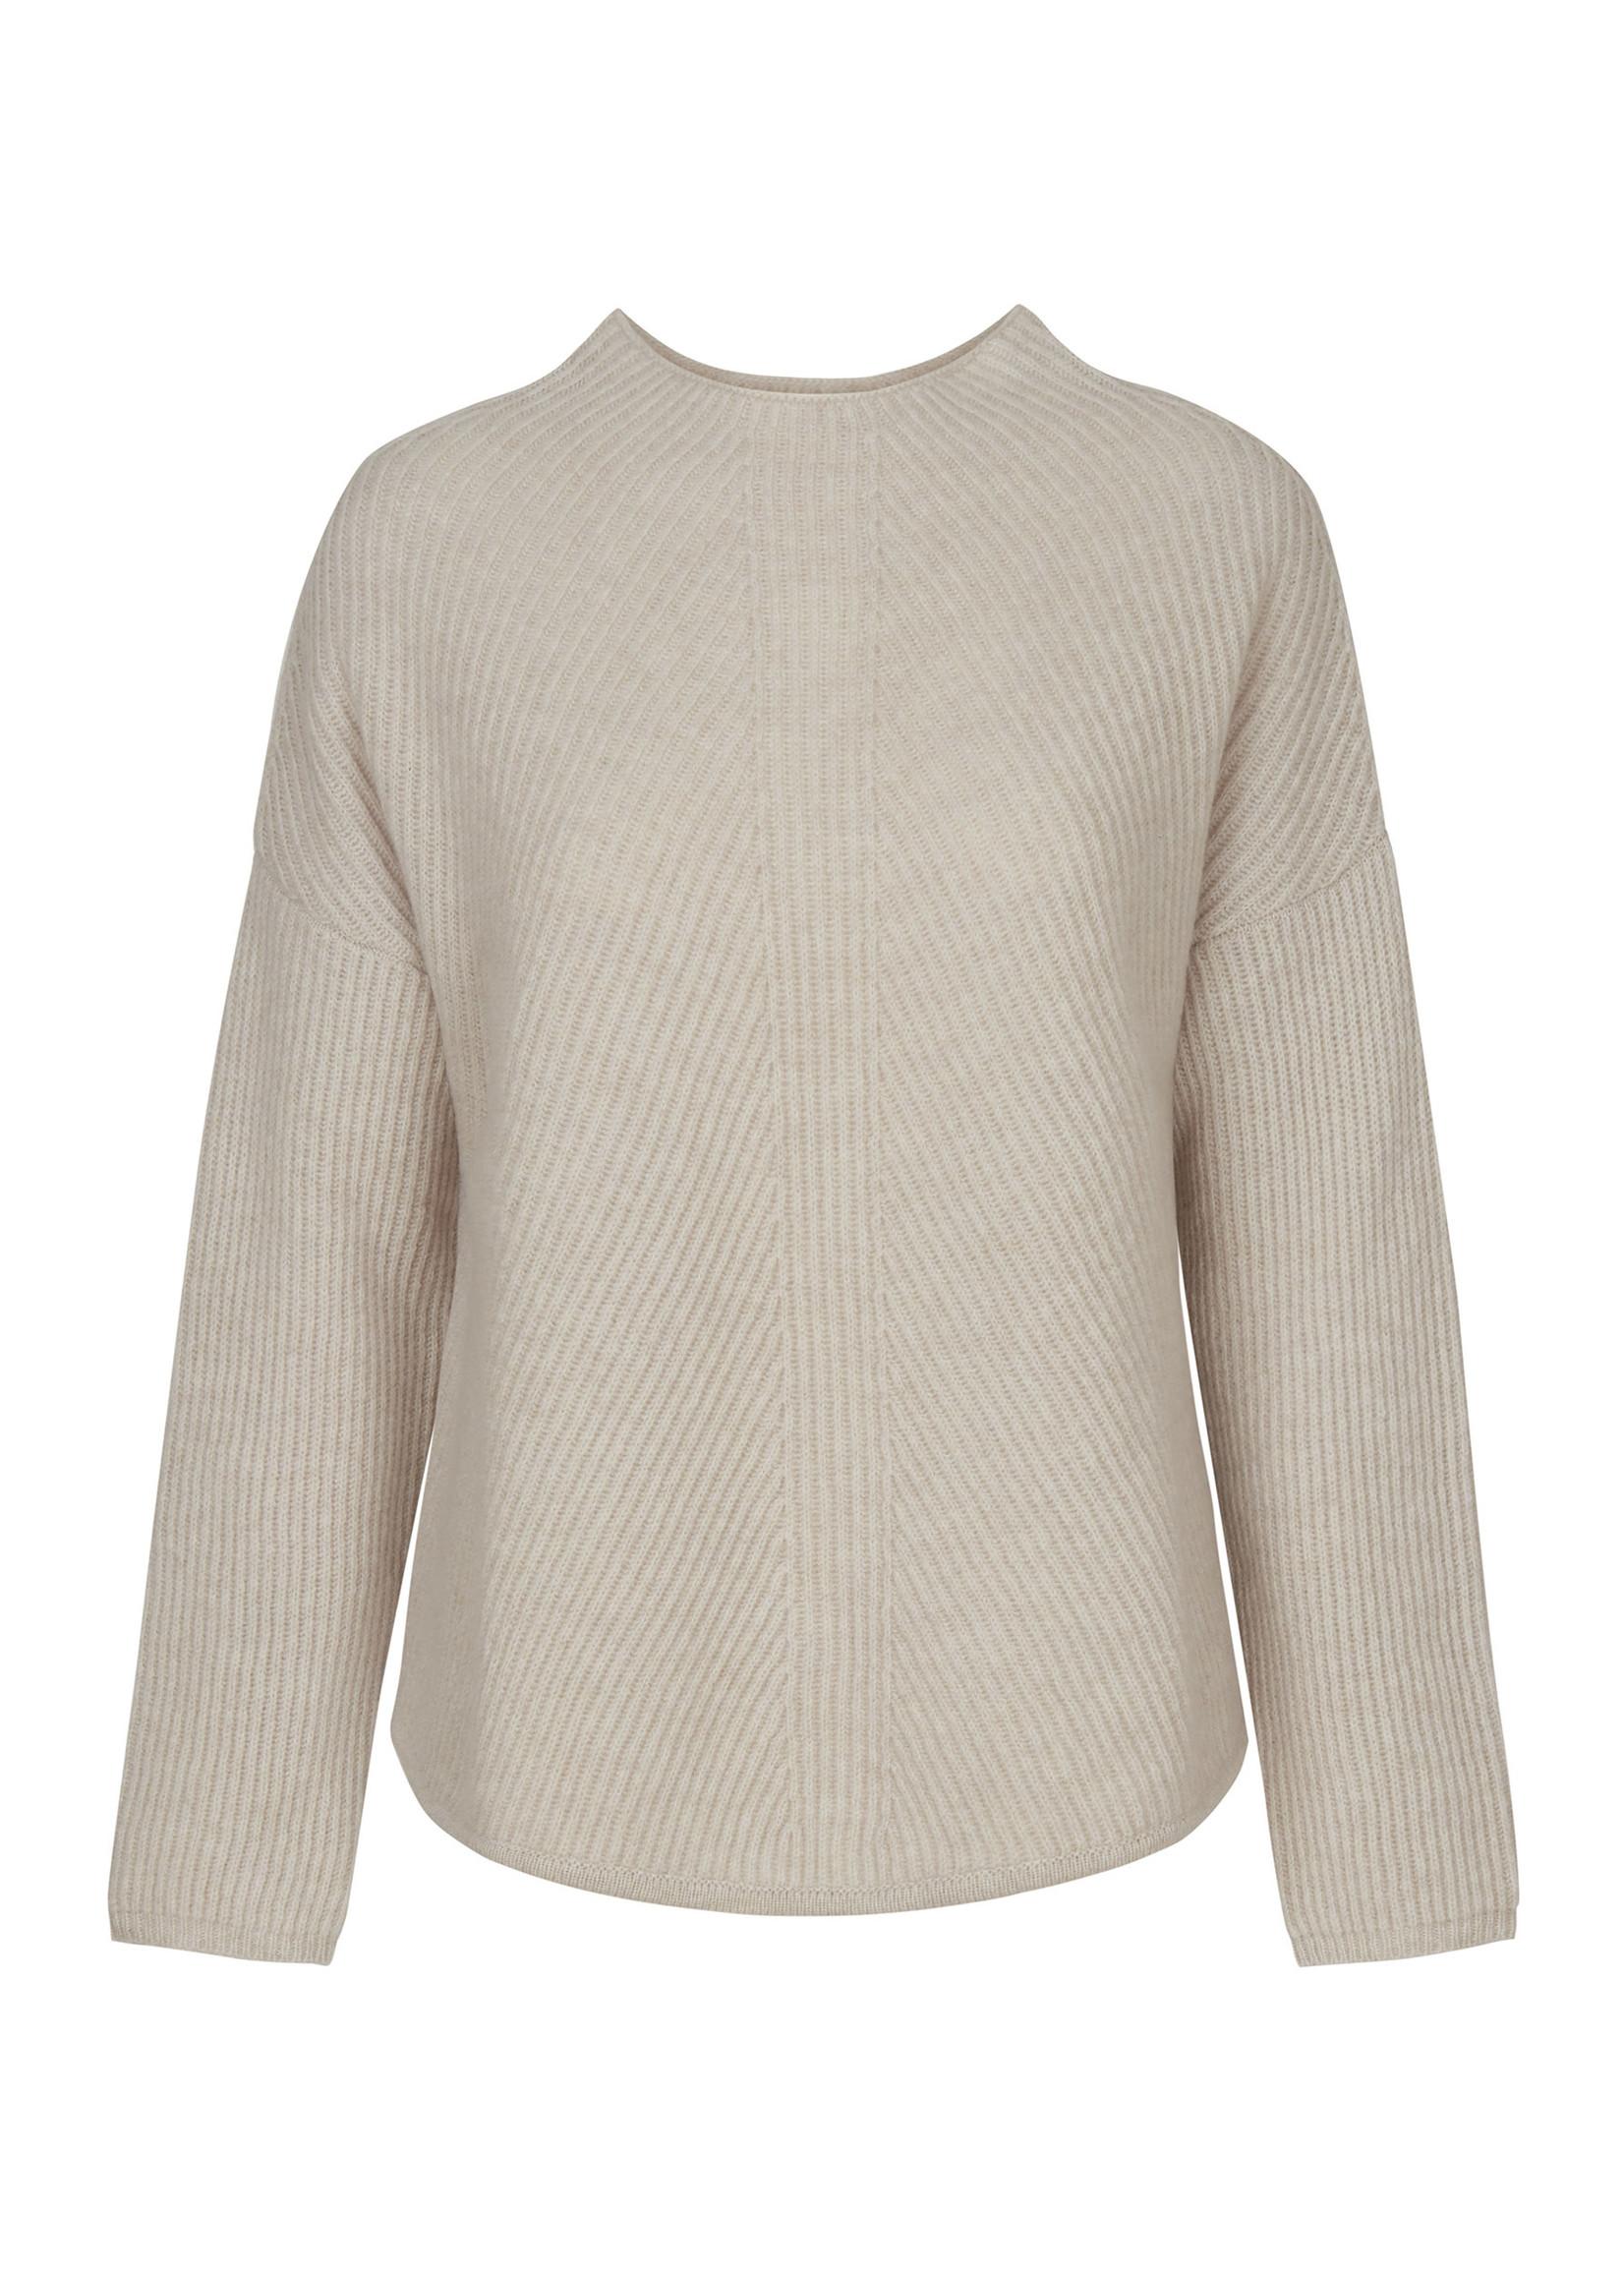 No Man's Land 55.124 Sweater